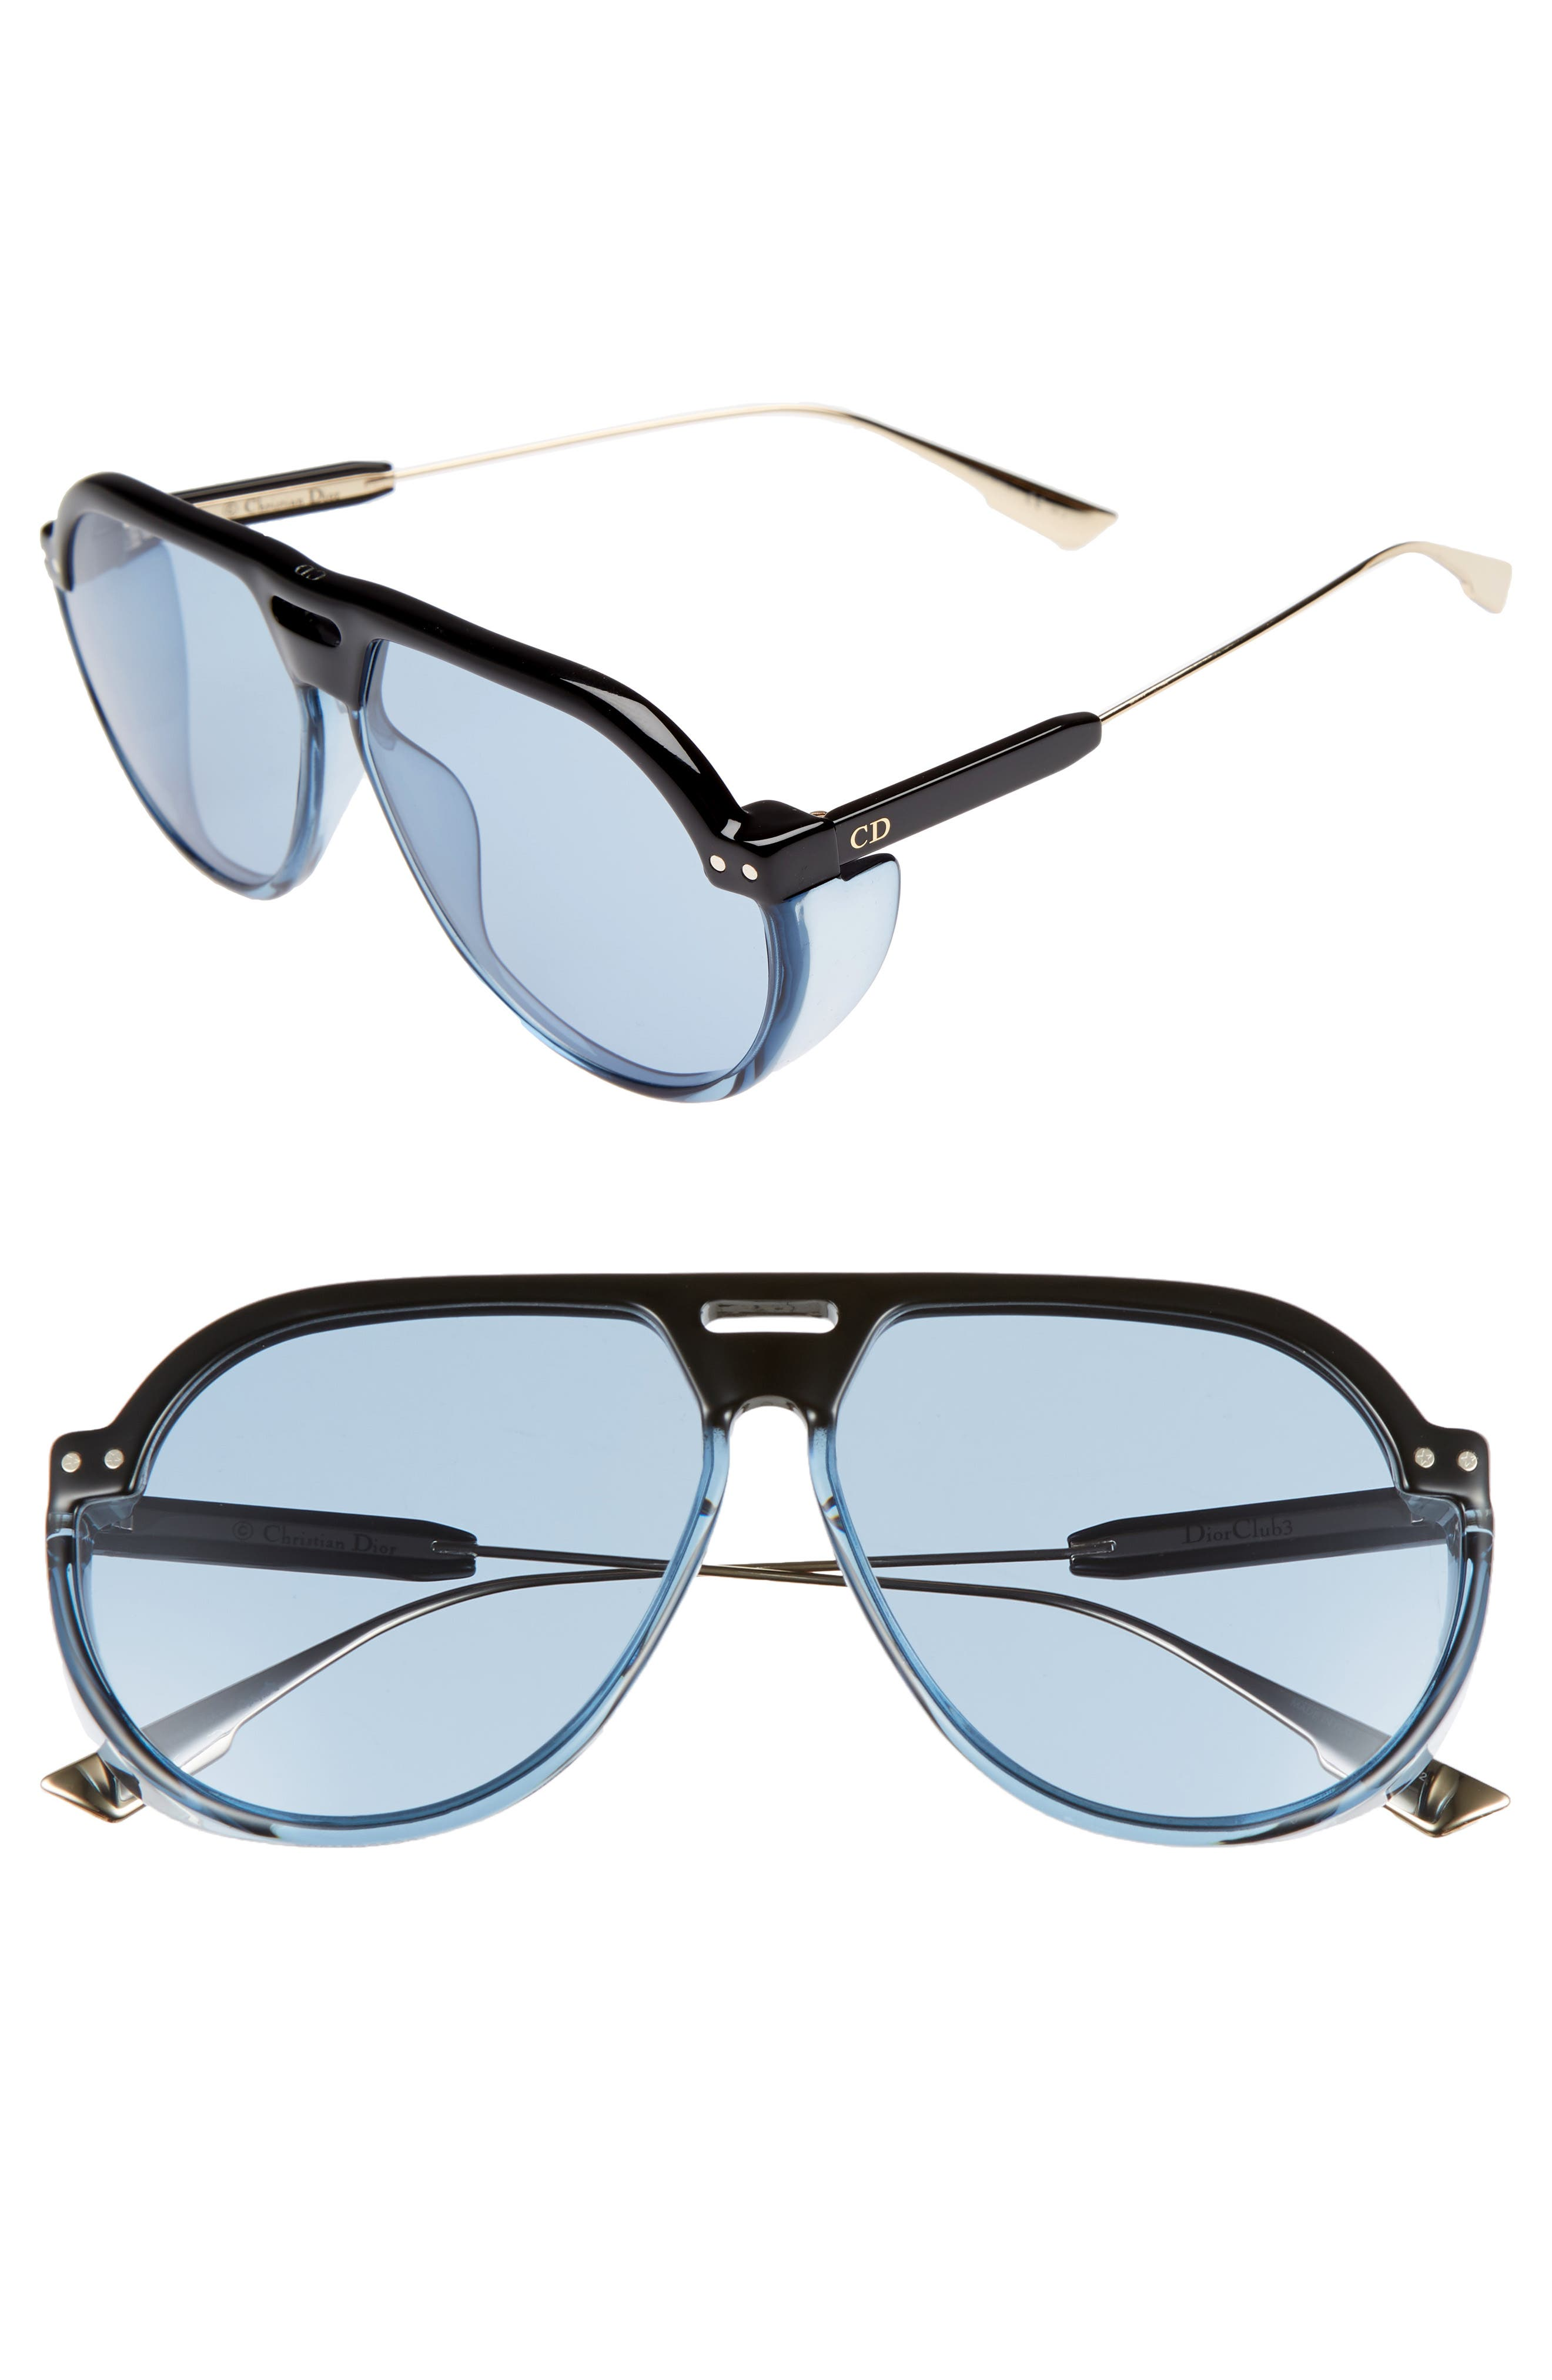 Dior DiorClub3S 61mm Pilot Sunglasses